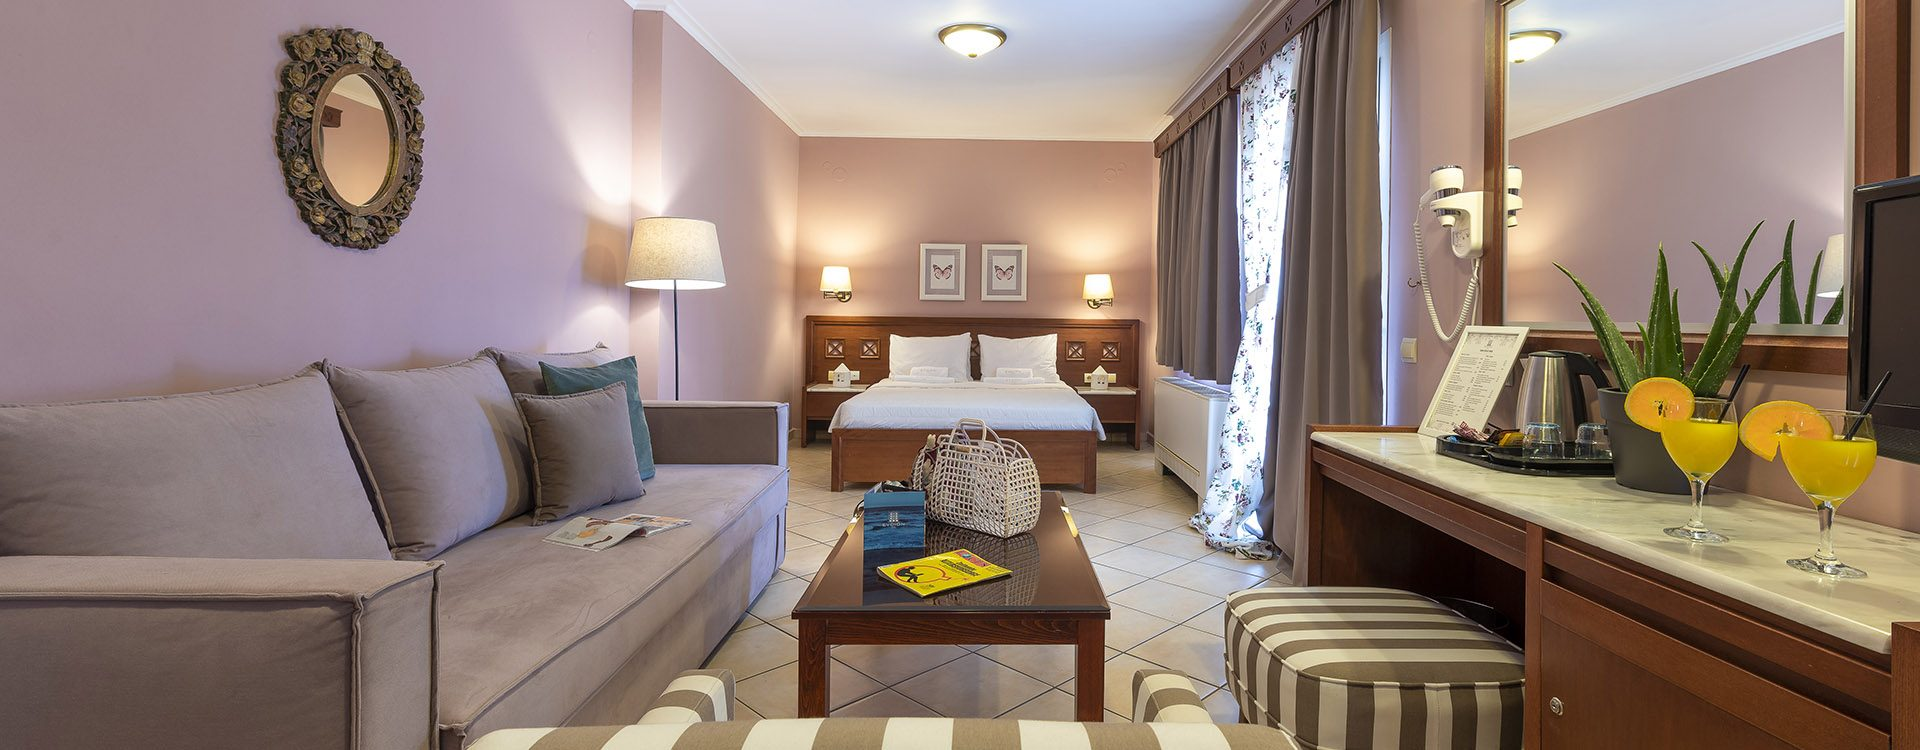 pieria hotels - Evdion Hotel